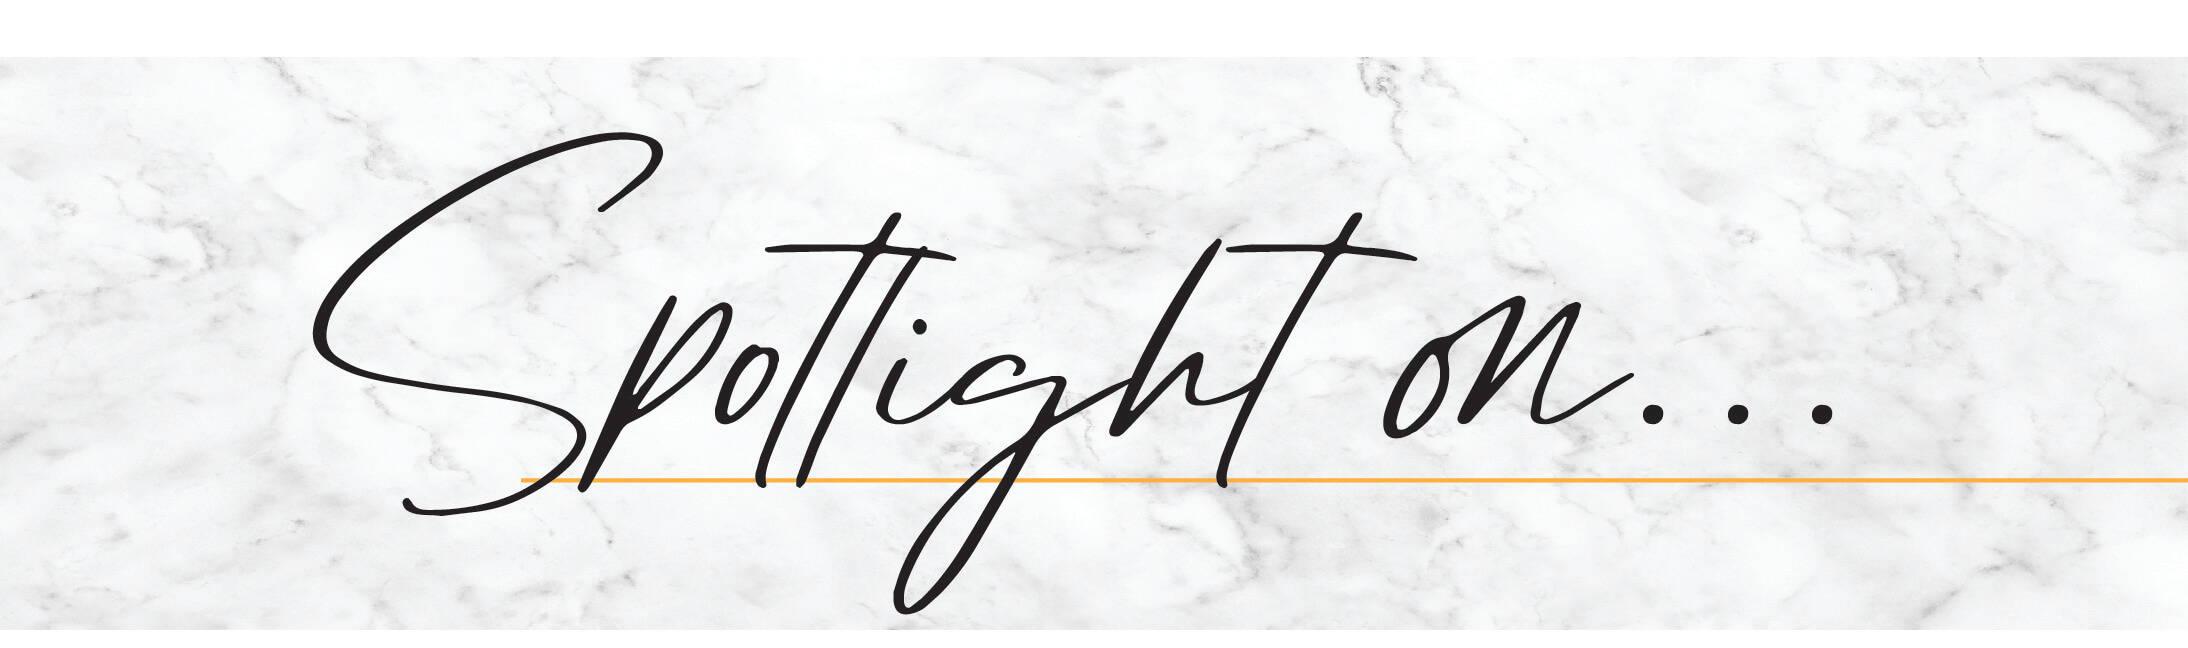 spotlight on text